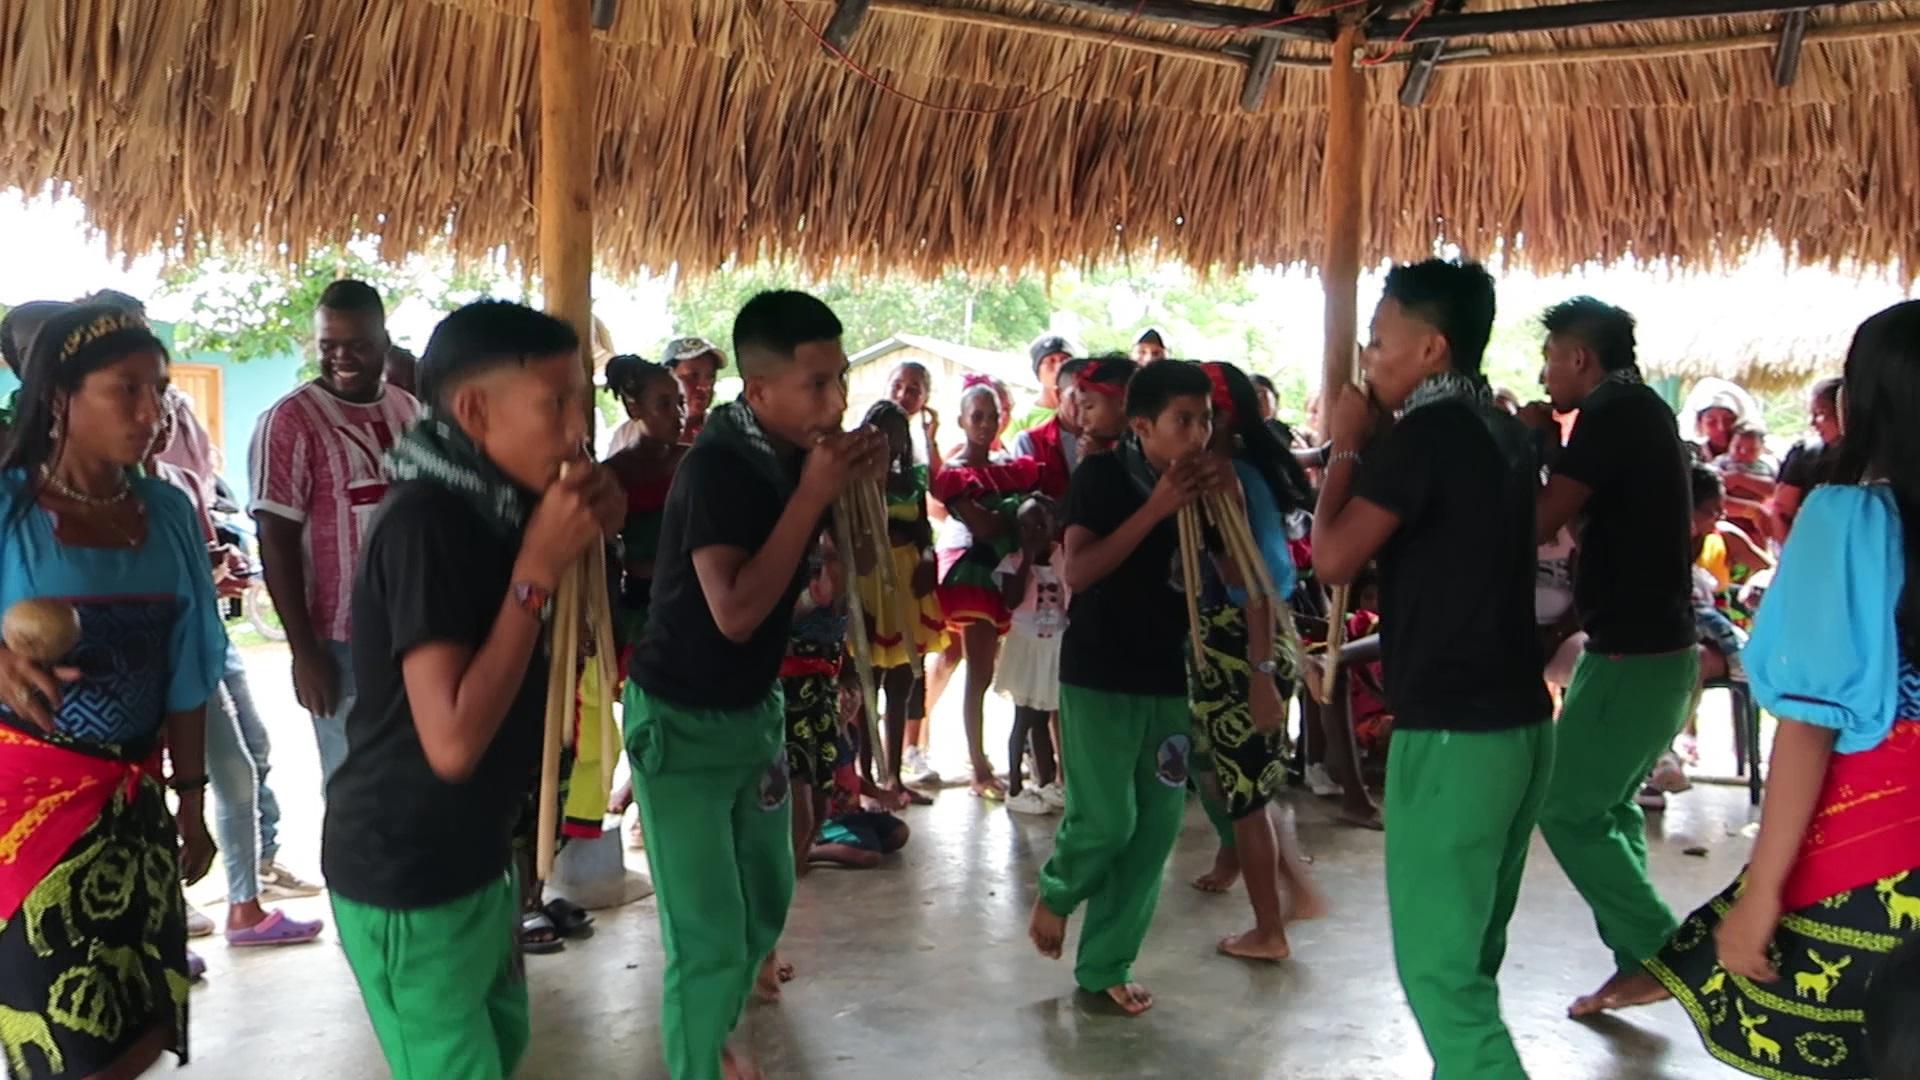 Arquía gunadule community dances